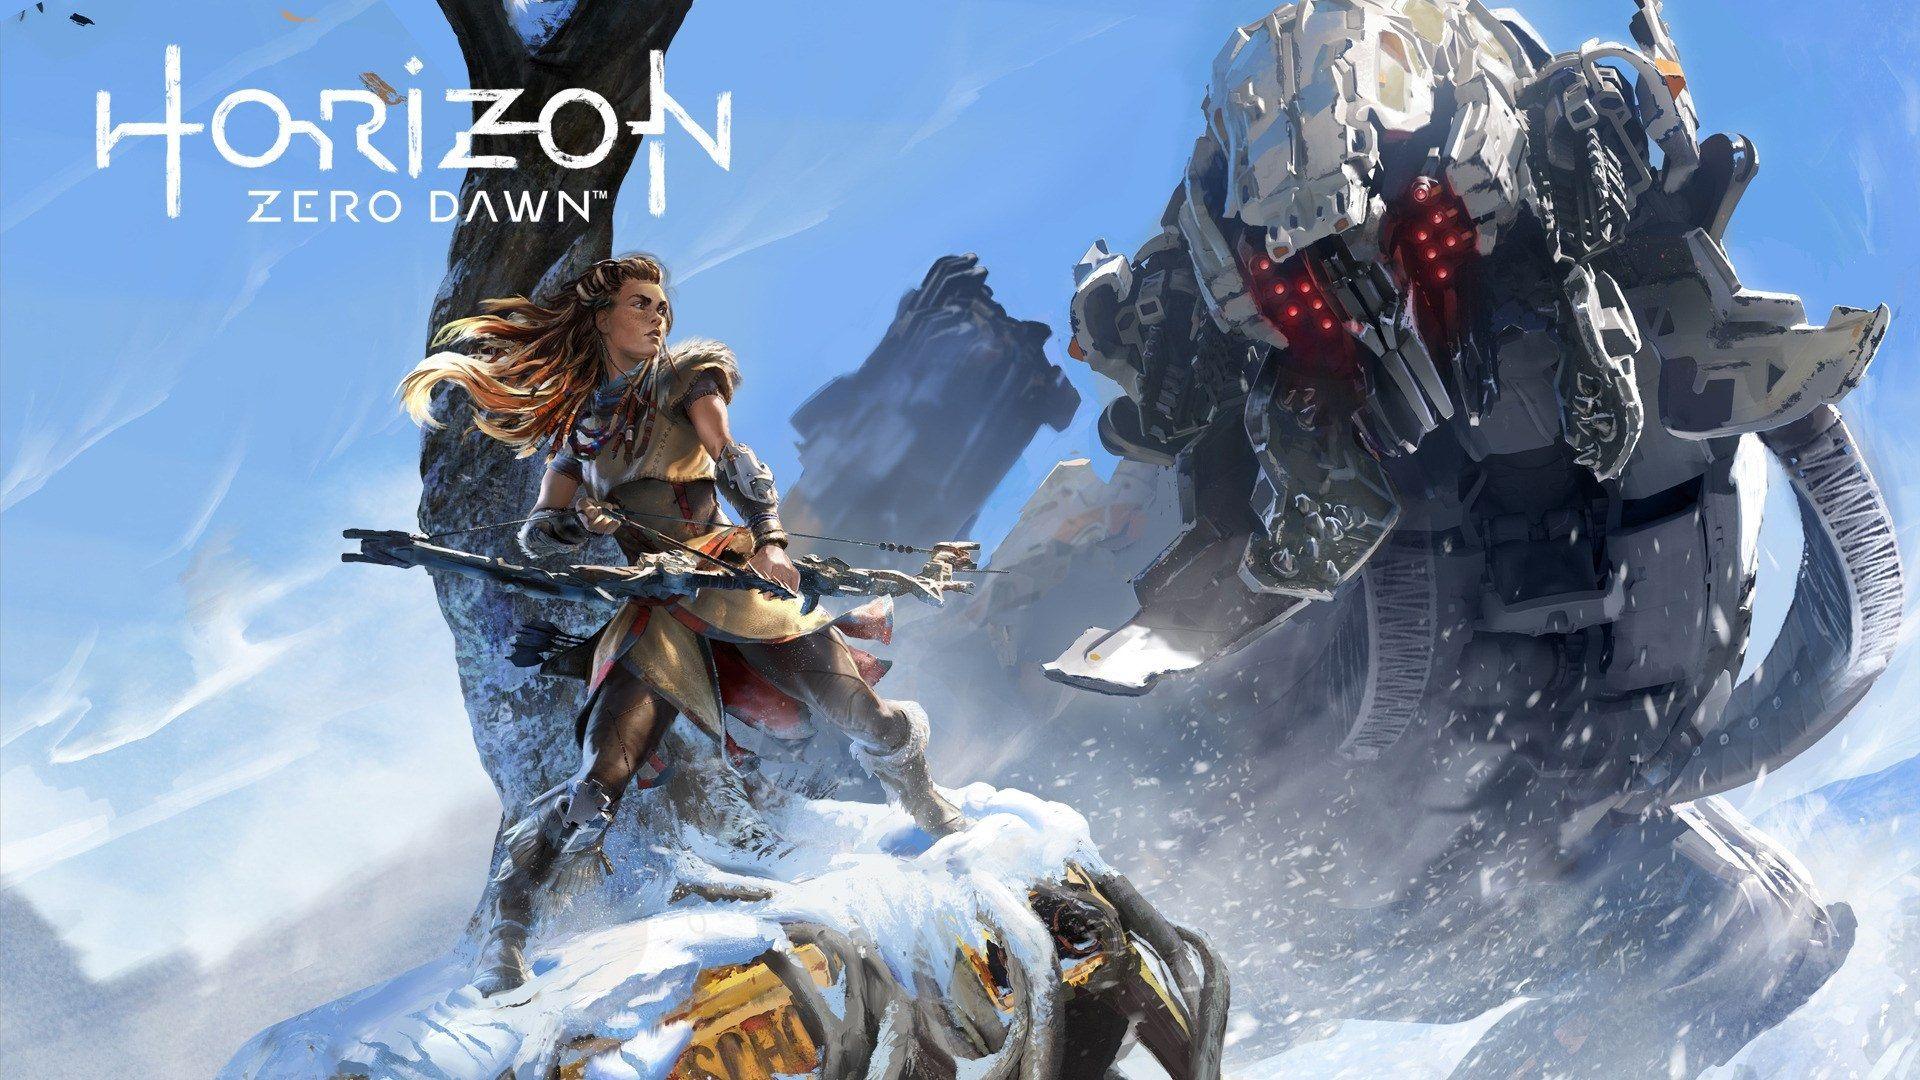 1920x1080 Horizon Zero Dawn Desktop Free Wallpaper Horizon Zero Dawn Wallpaper Horizon Zero Dawn Gameplay Horizon Zero Dawn